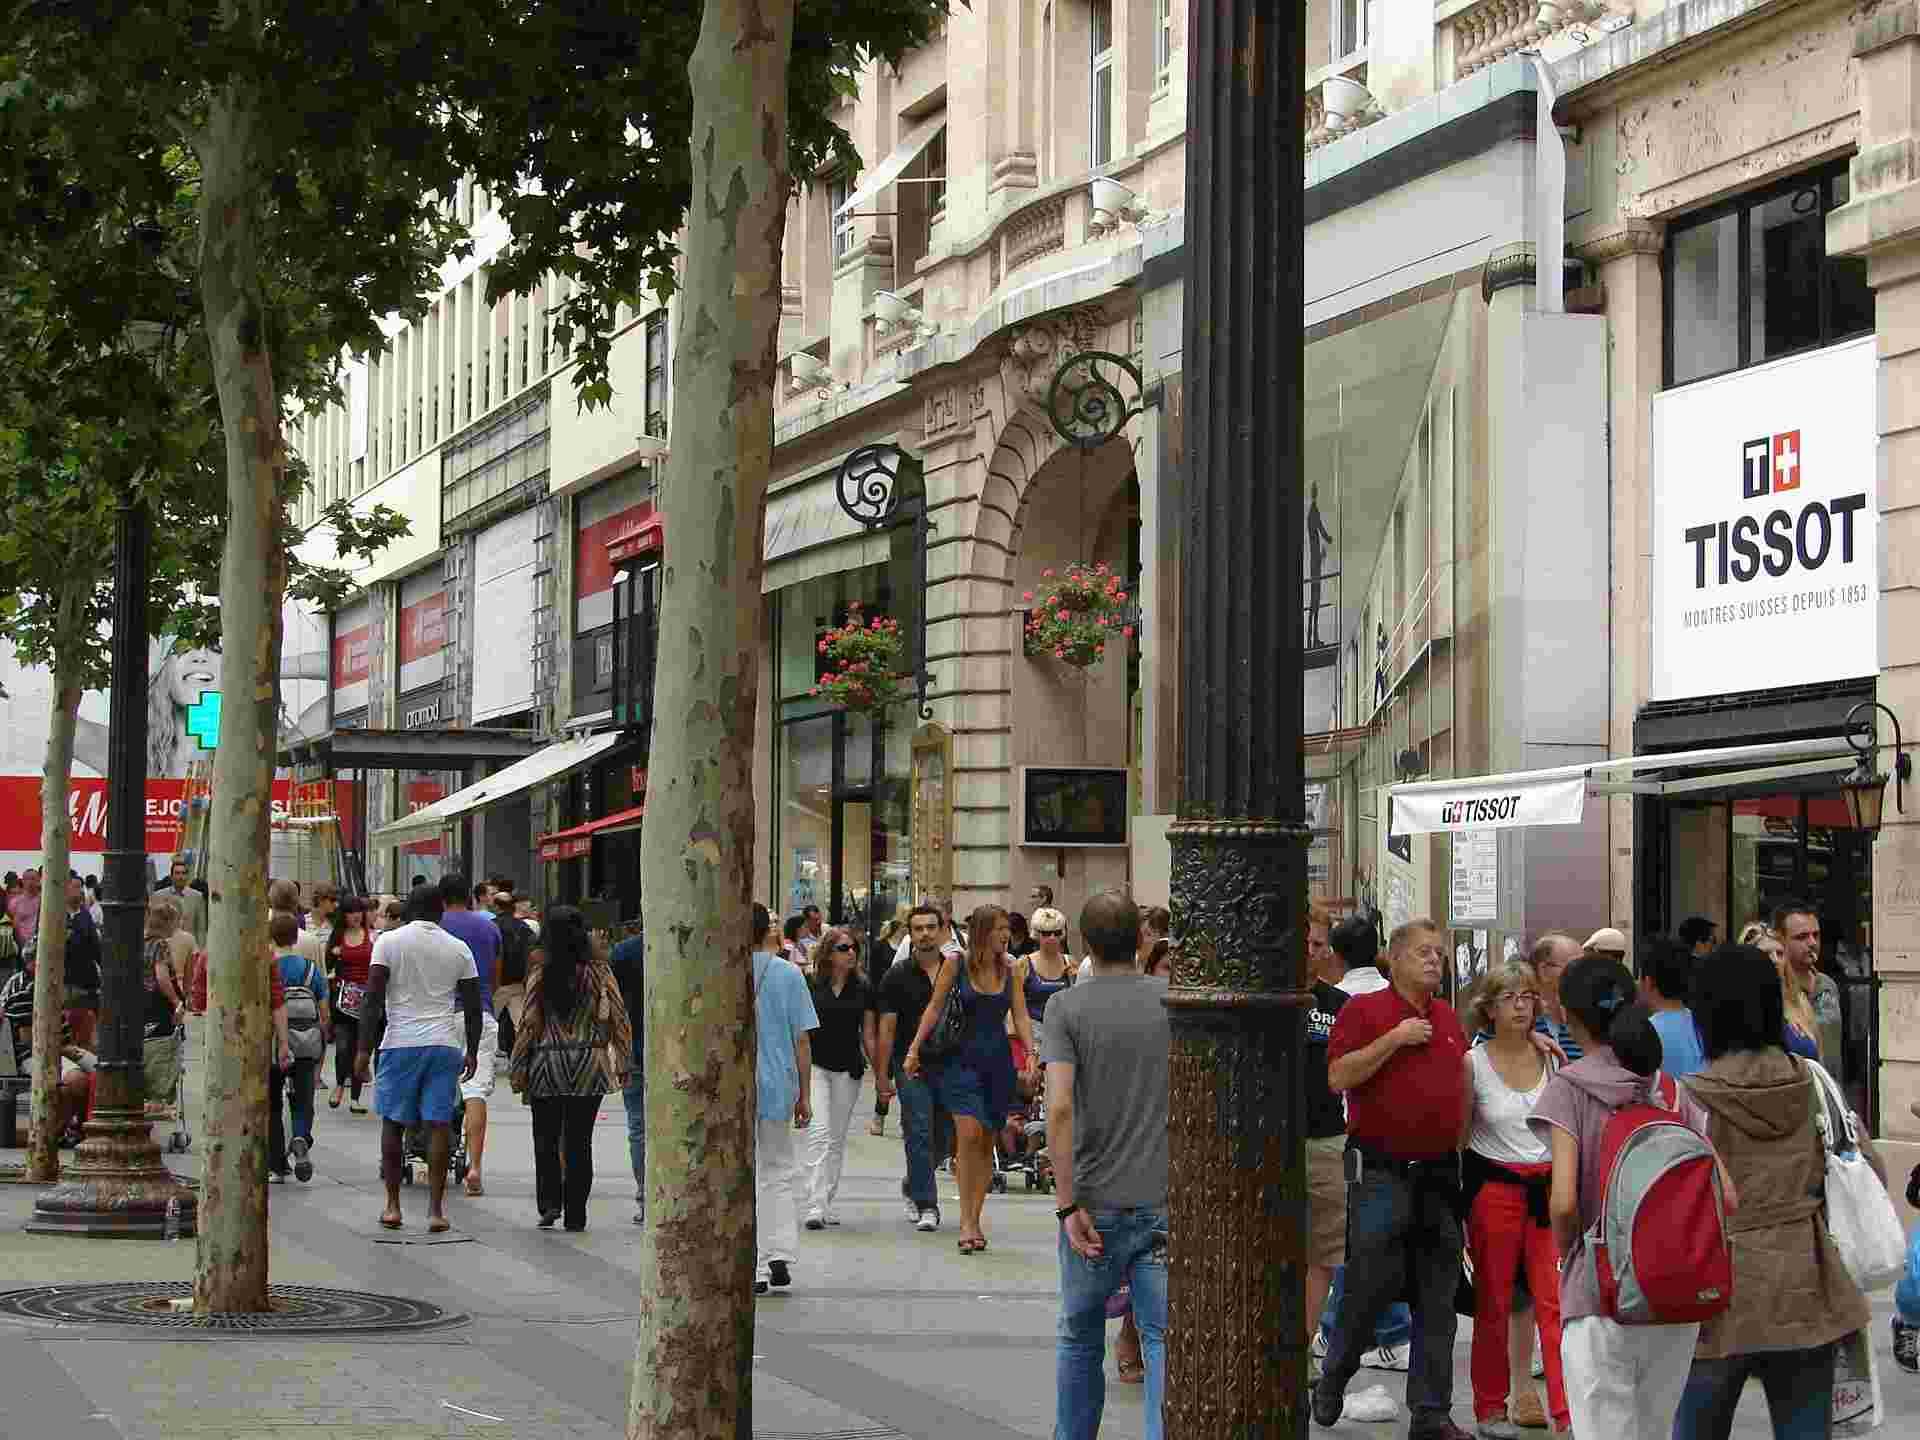 Turismo em Paris :avenida champs elysees